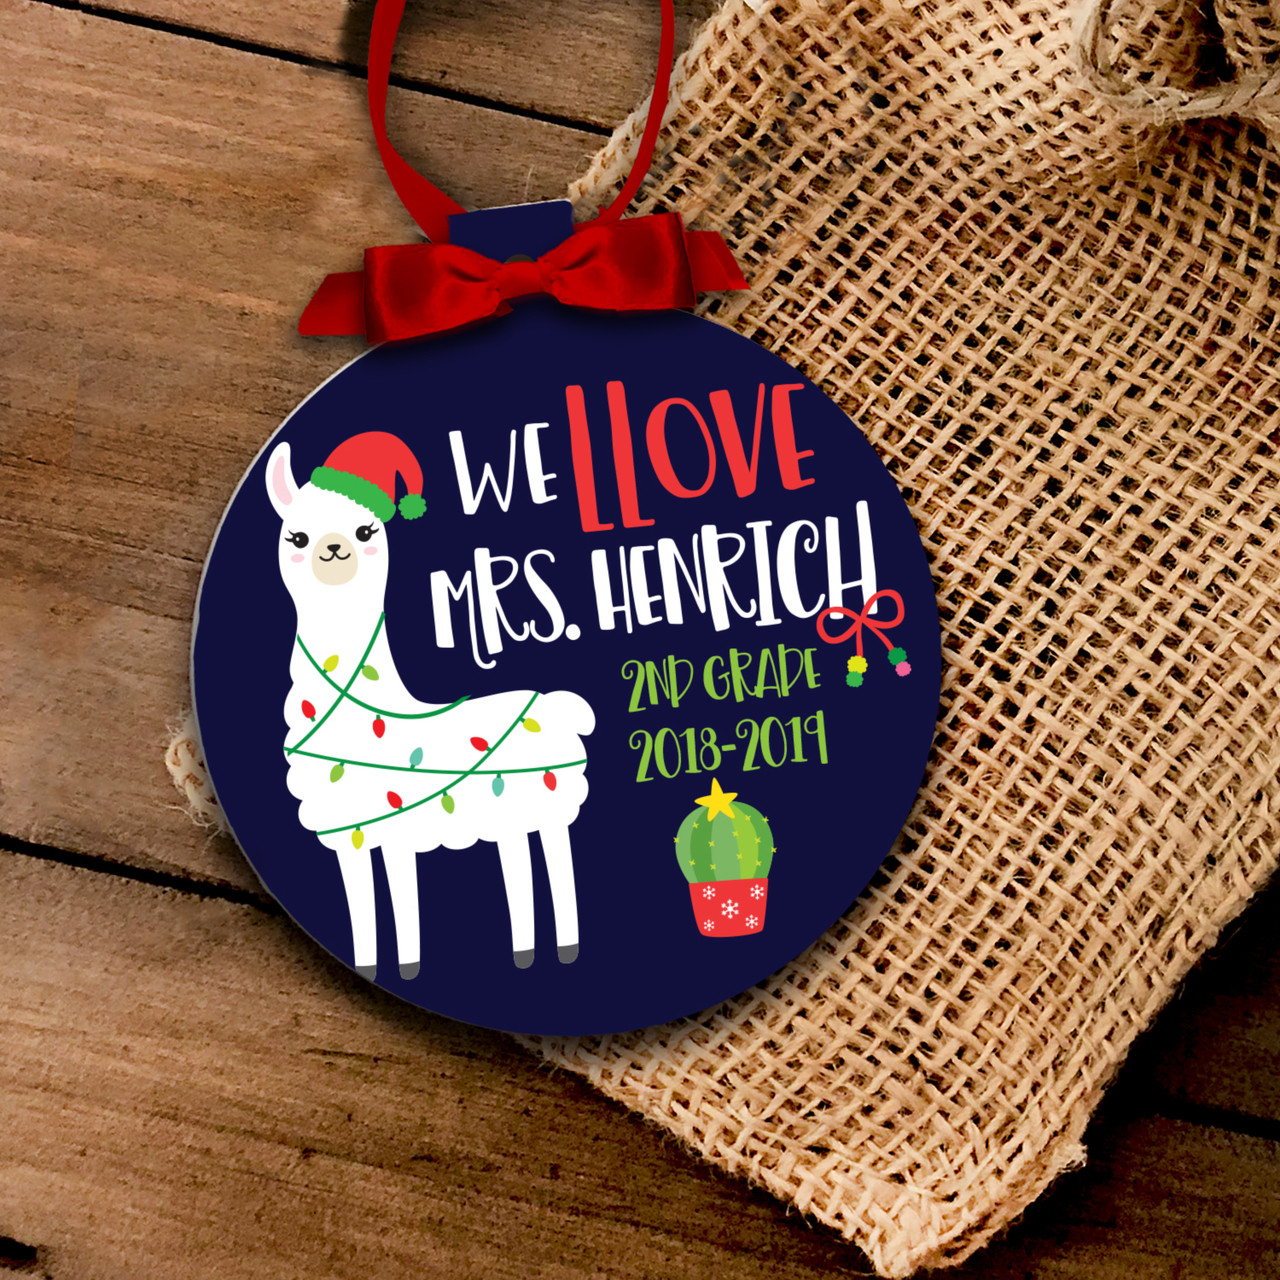 Christmas Gifts For Teachers 2018.Teacher Love Llama Personalized Christmas Ornament